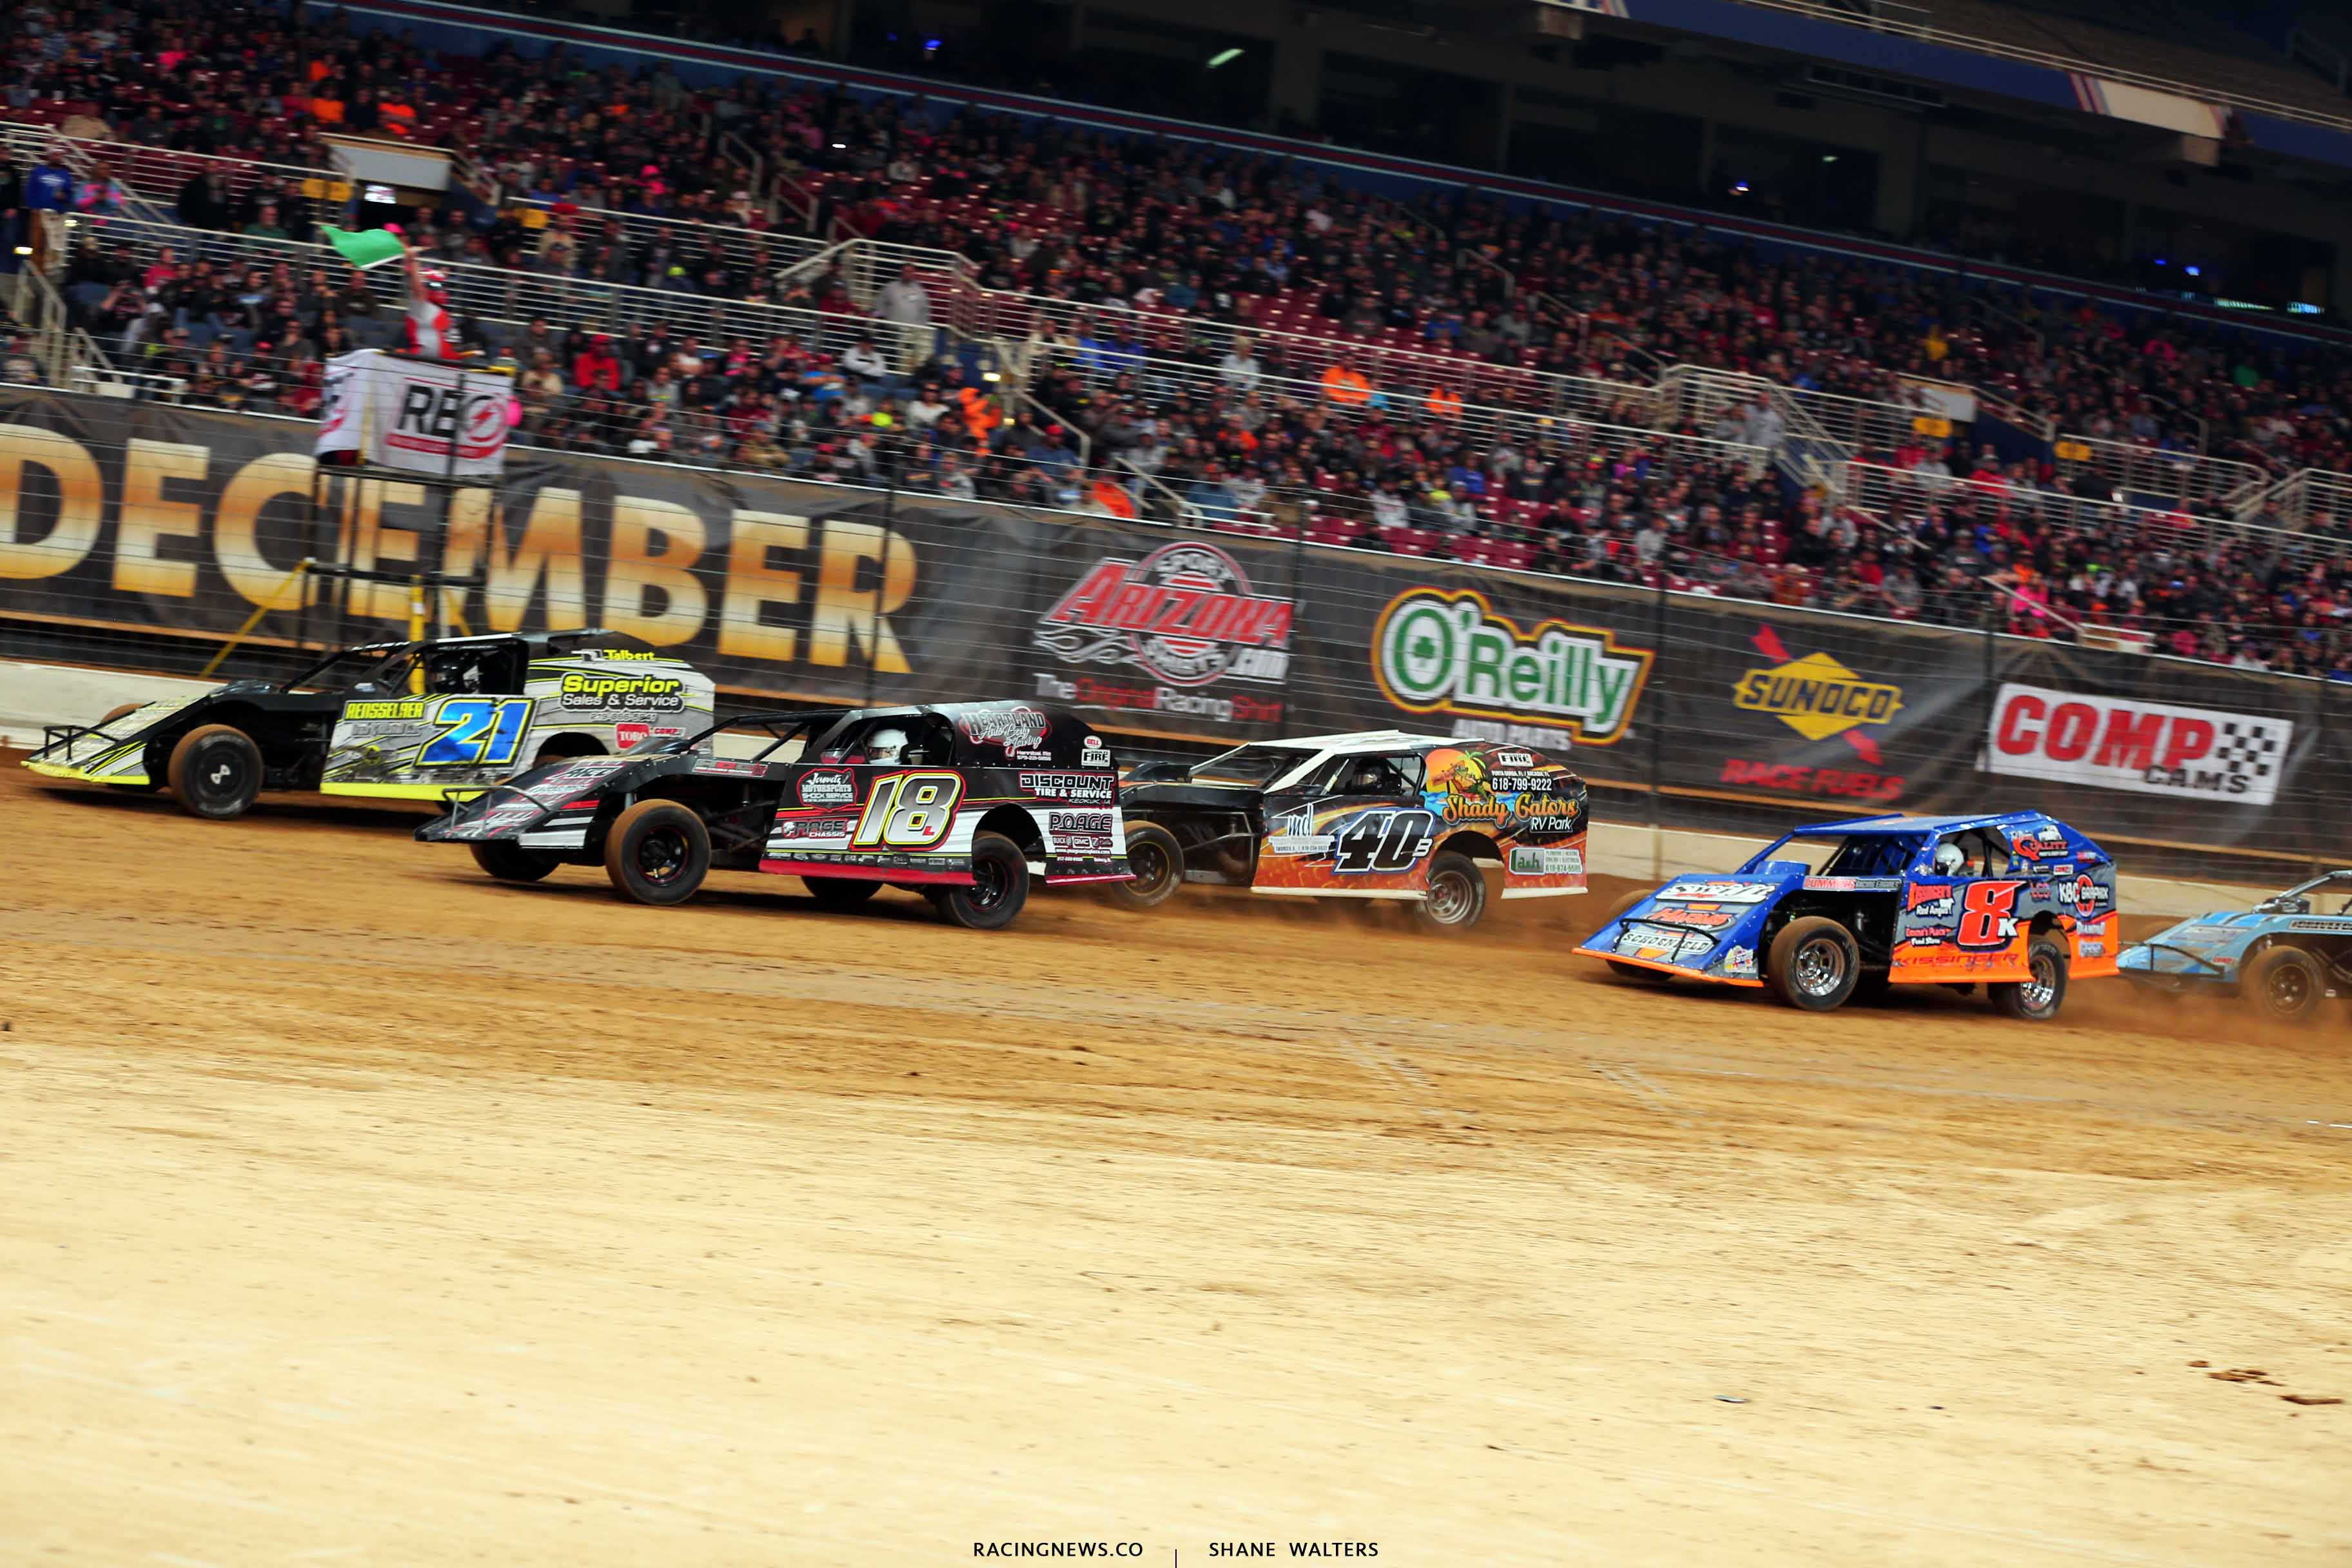 Derek Losh, Michael Long and Kyle Bronson in the Gateway Dirt Nationals - Dirt Modifieds 2813